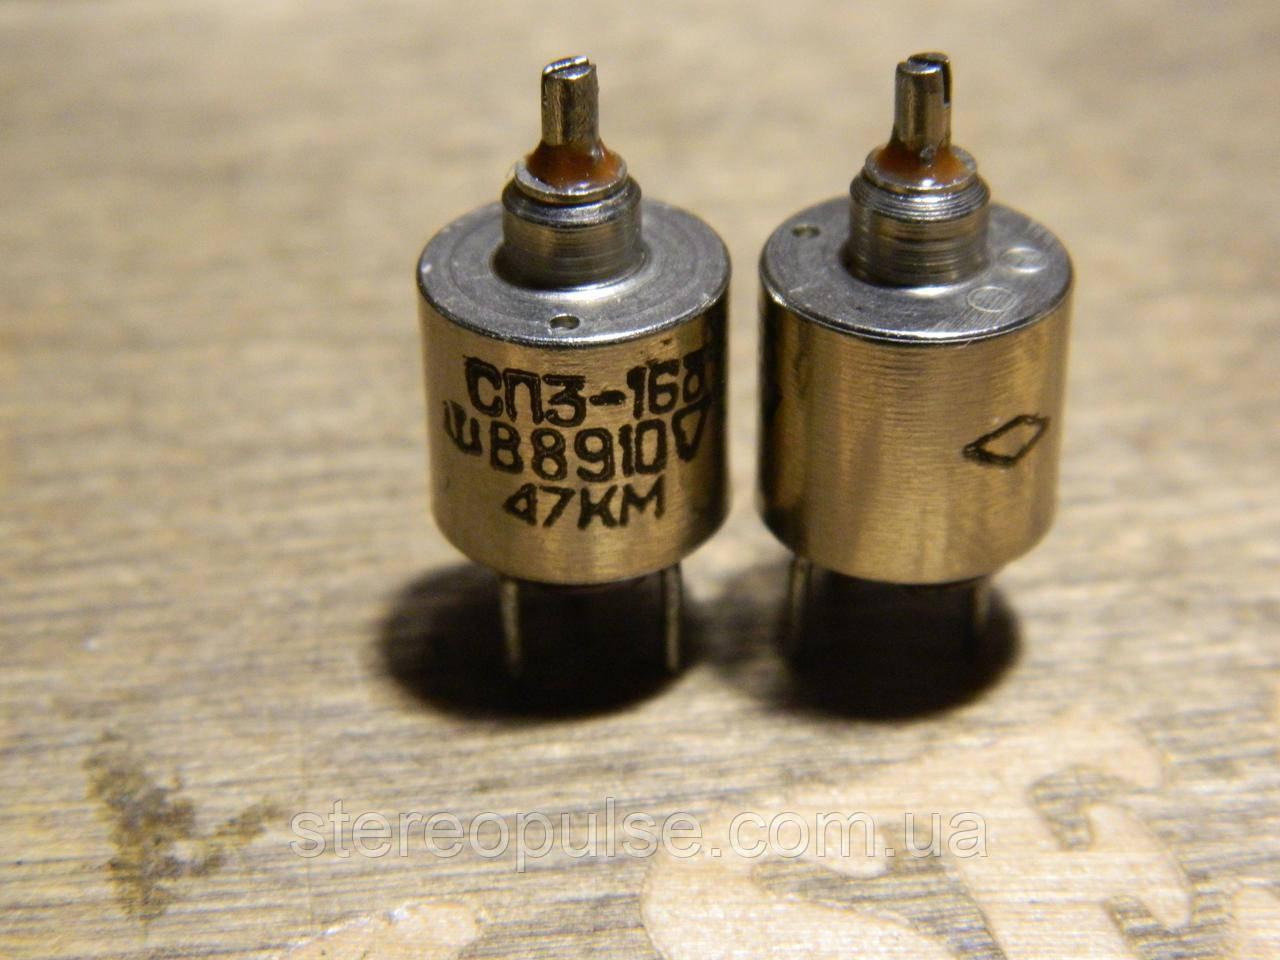 Резистор СП3 - 16Б 47 кОм